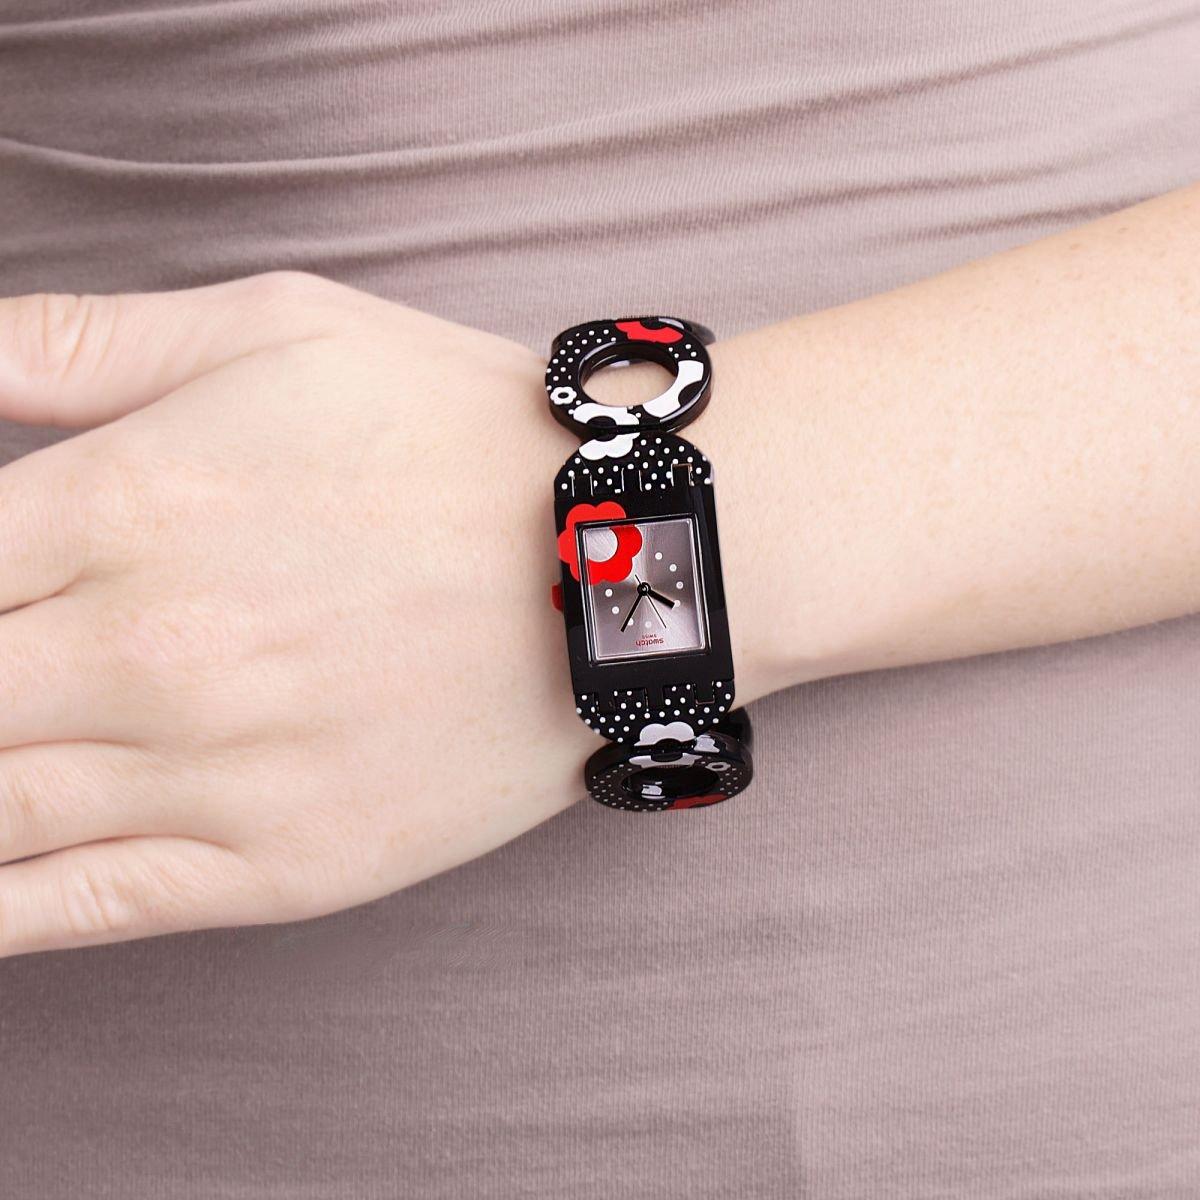 Reloj Swatch Sbracciale Efectivo 24mm Buzz Mujer Elástica 17 Subb126a Romántico wvmN8n0